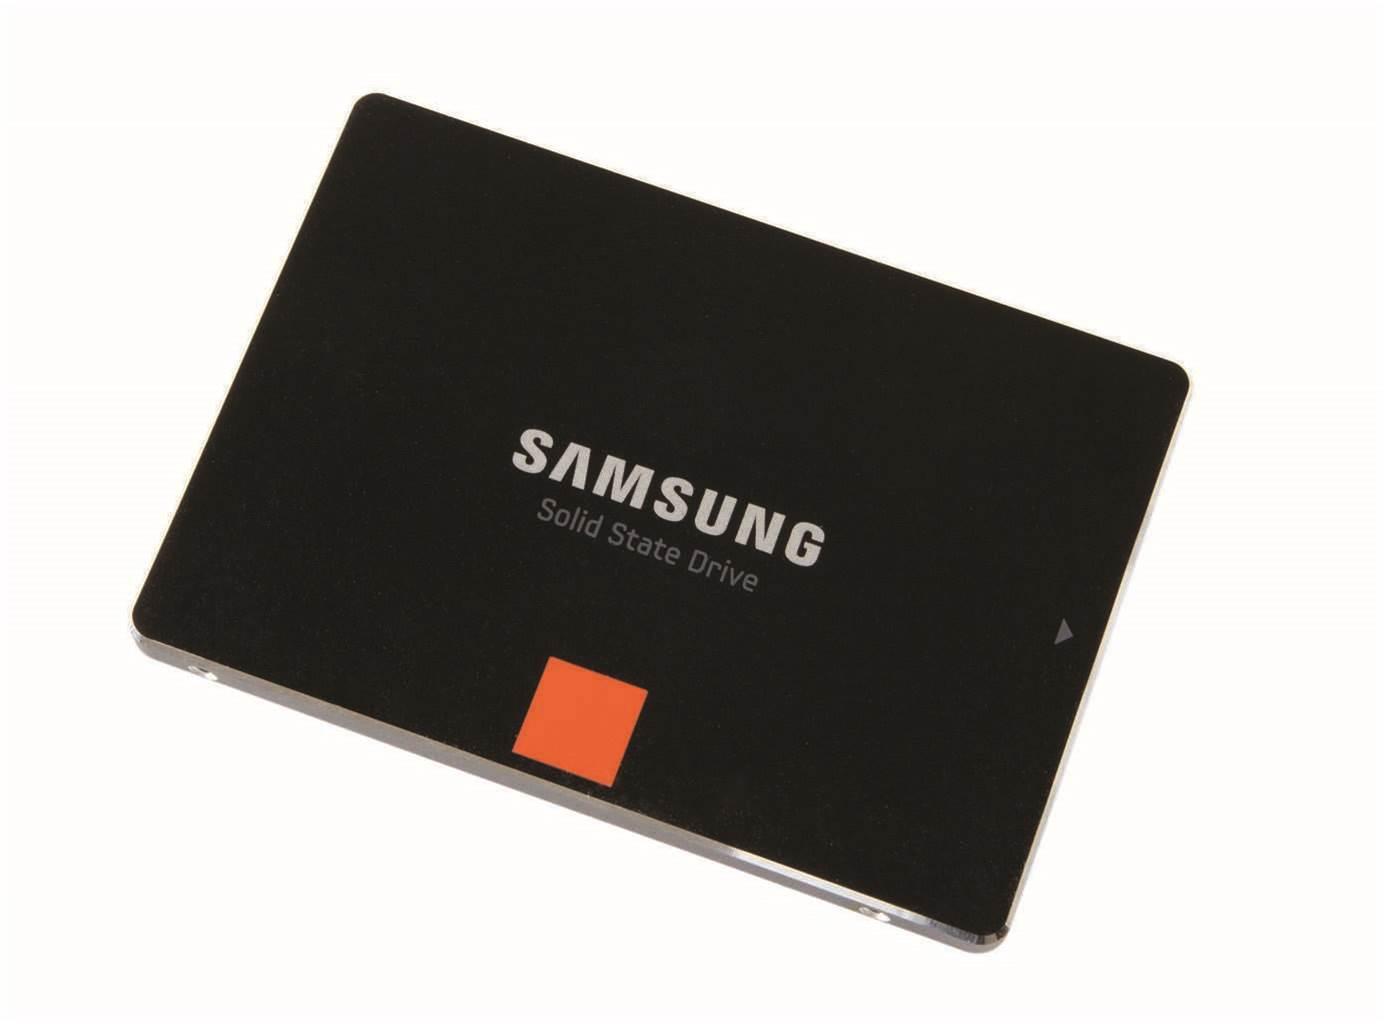 Labs Brief: Samsung 840 Pro SSD